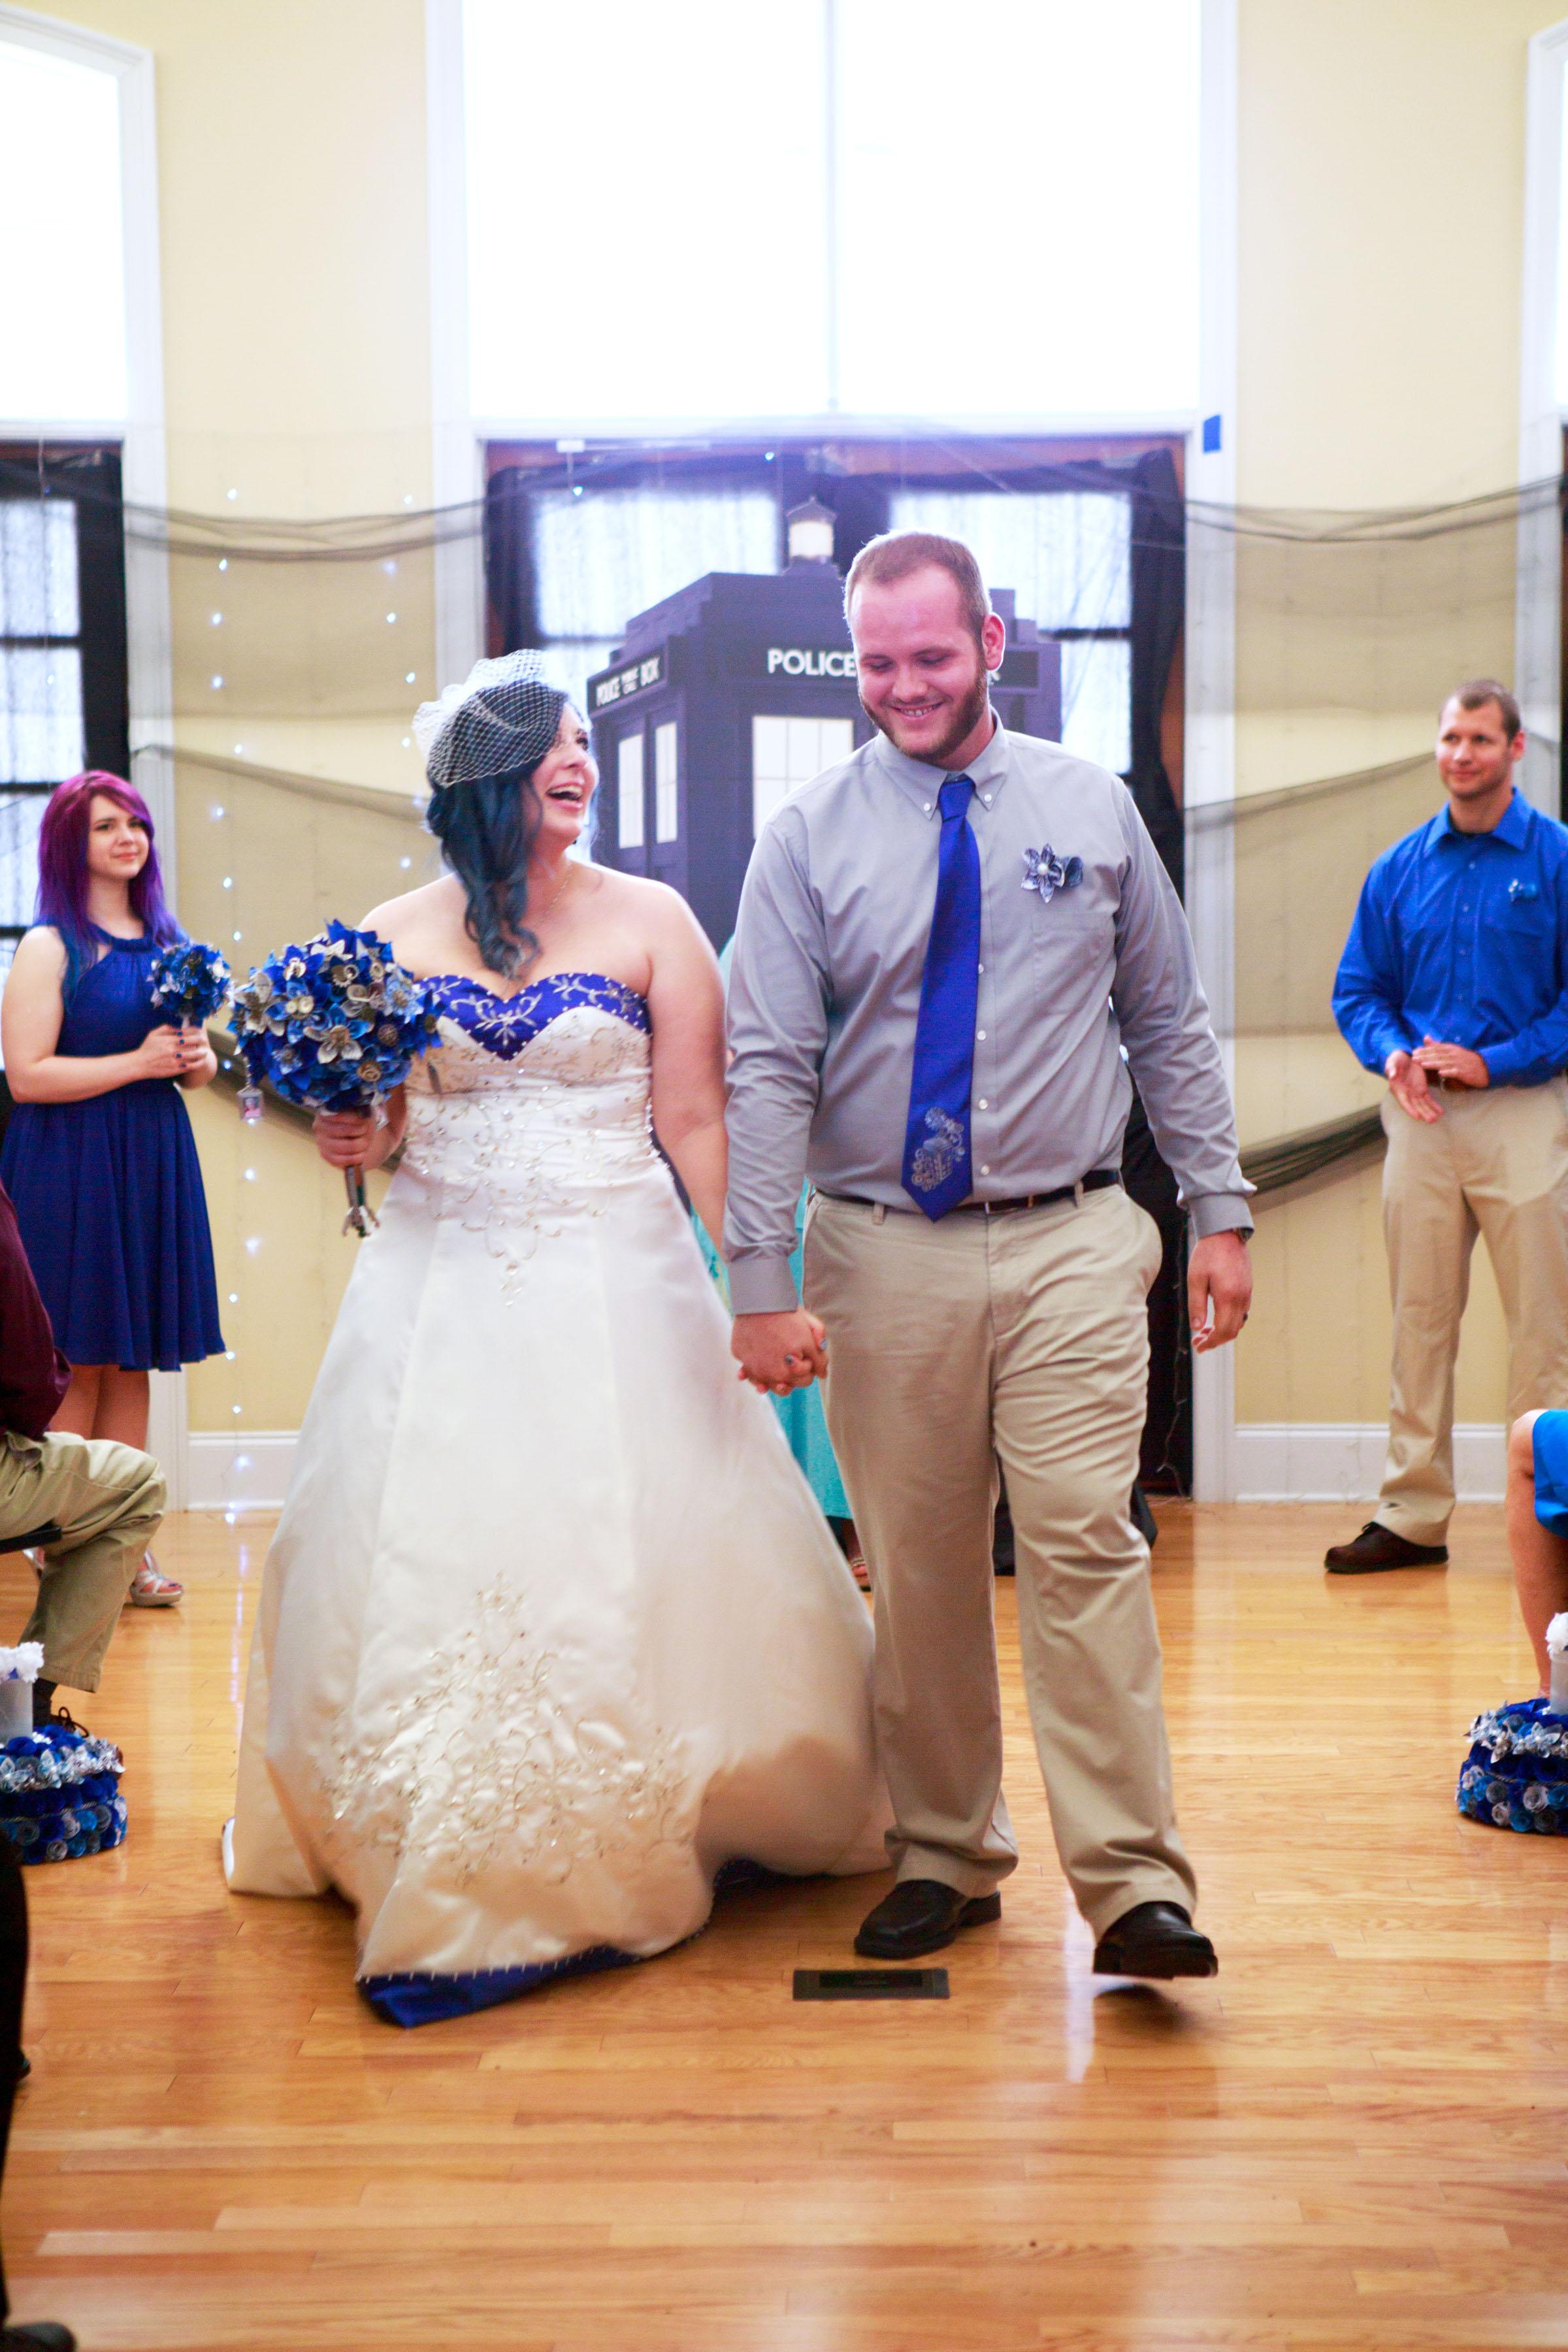 NC_Wedding_Photographer_Tiffany_Abruzzo_Ceremony_55.jpg